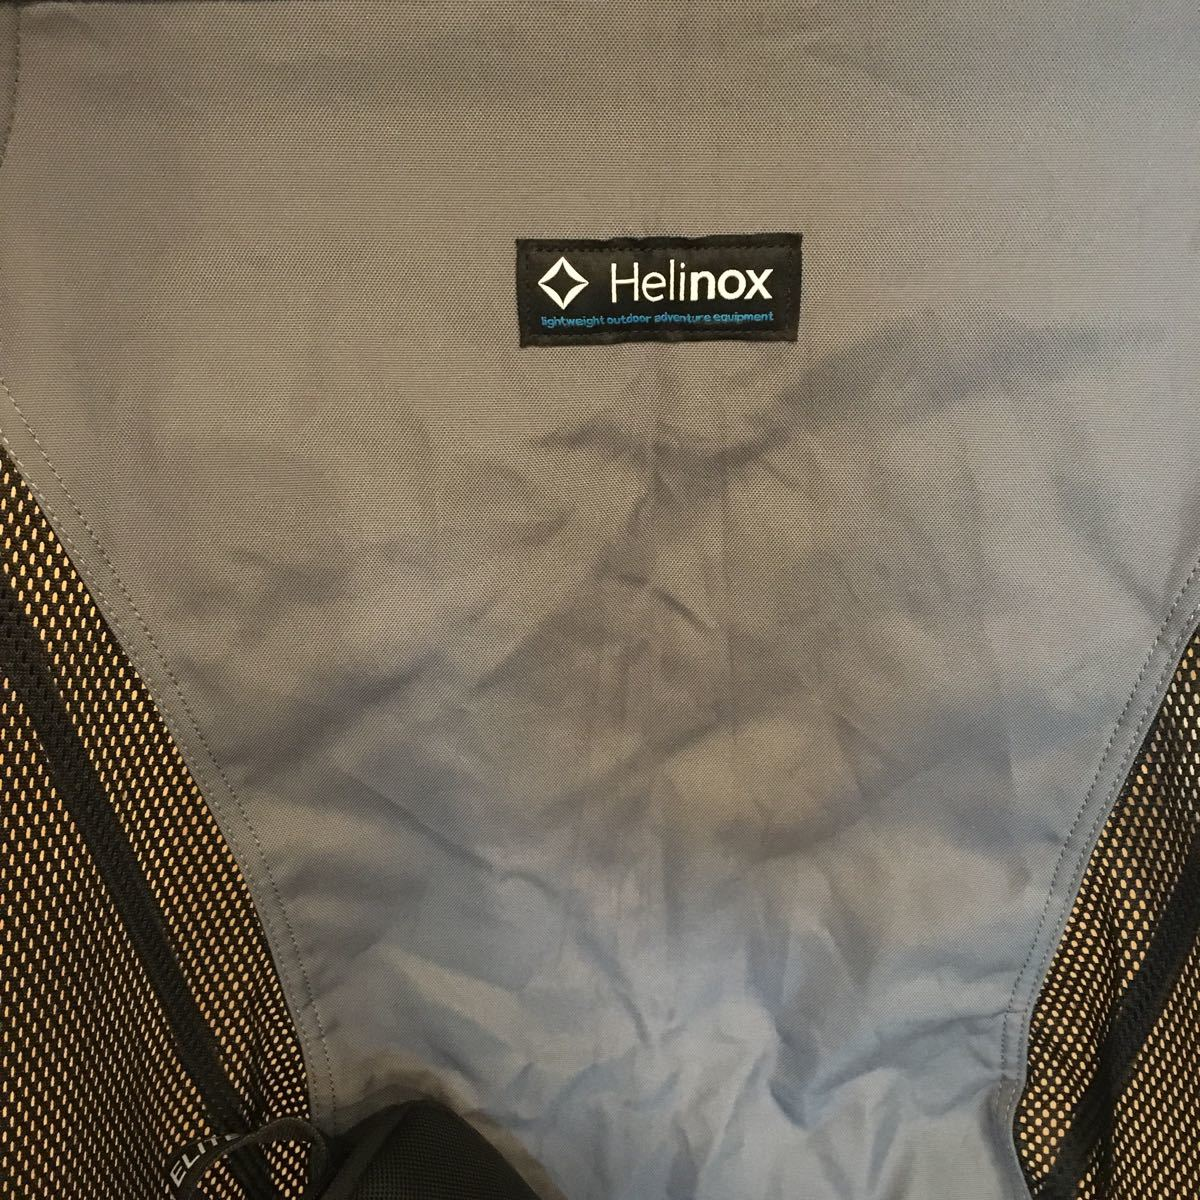 Helinox ヘリノックス アウトドアチェア チェアエリート  ChairElite